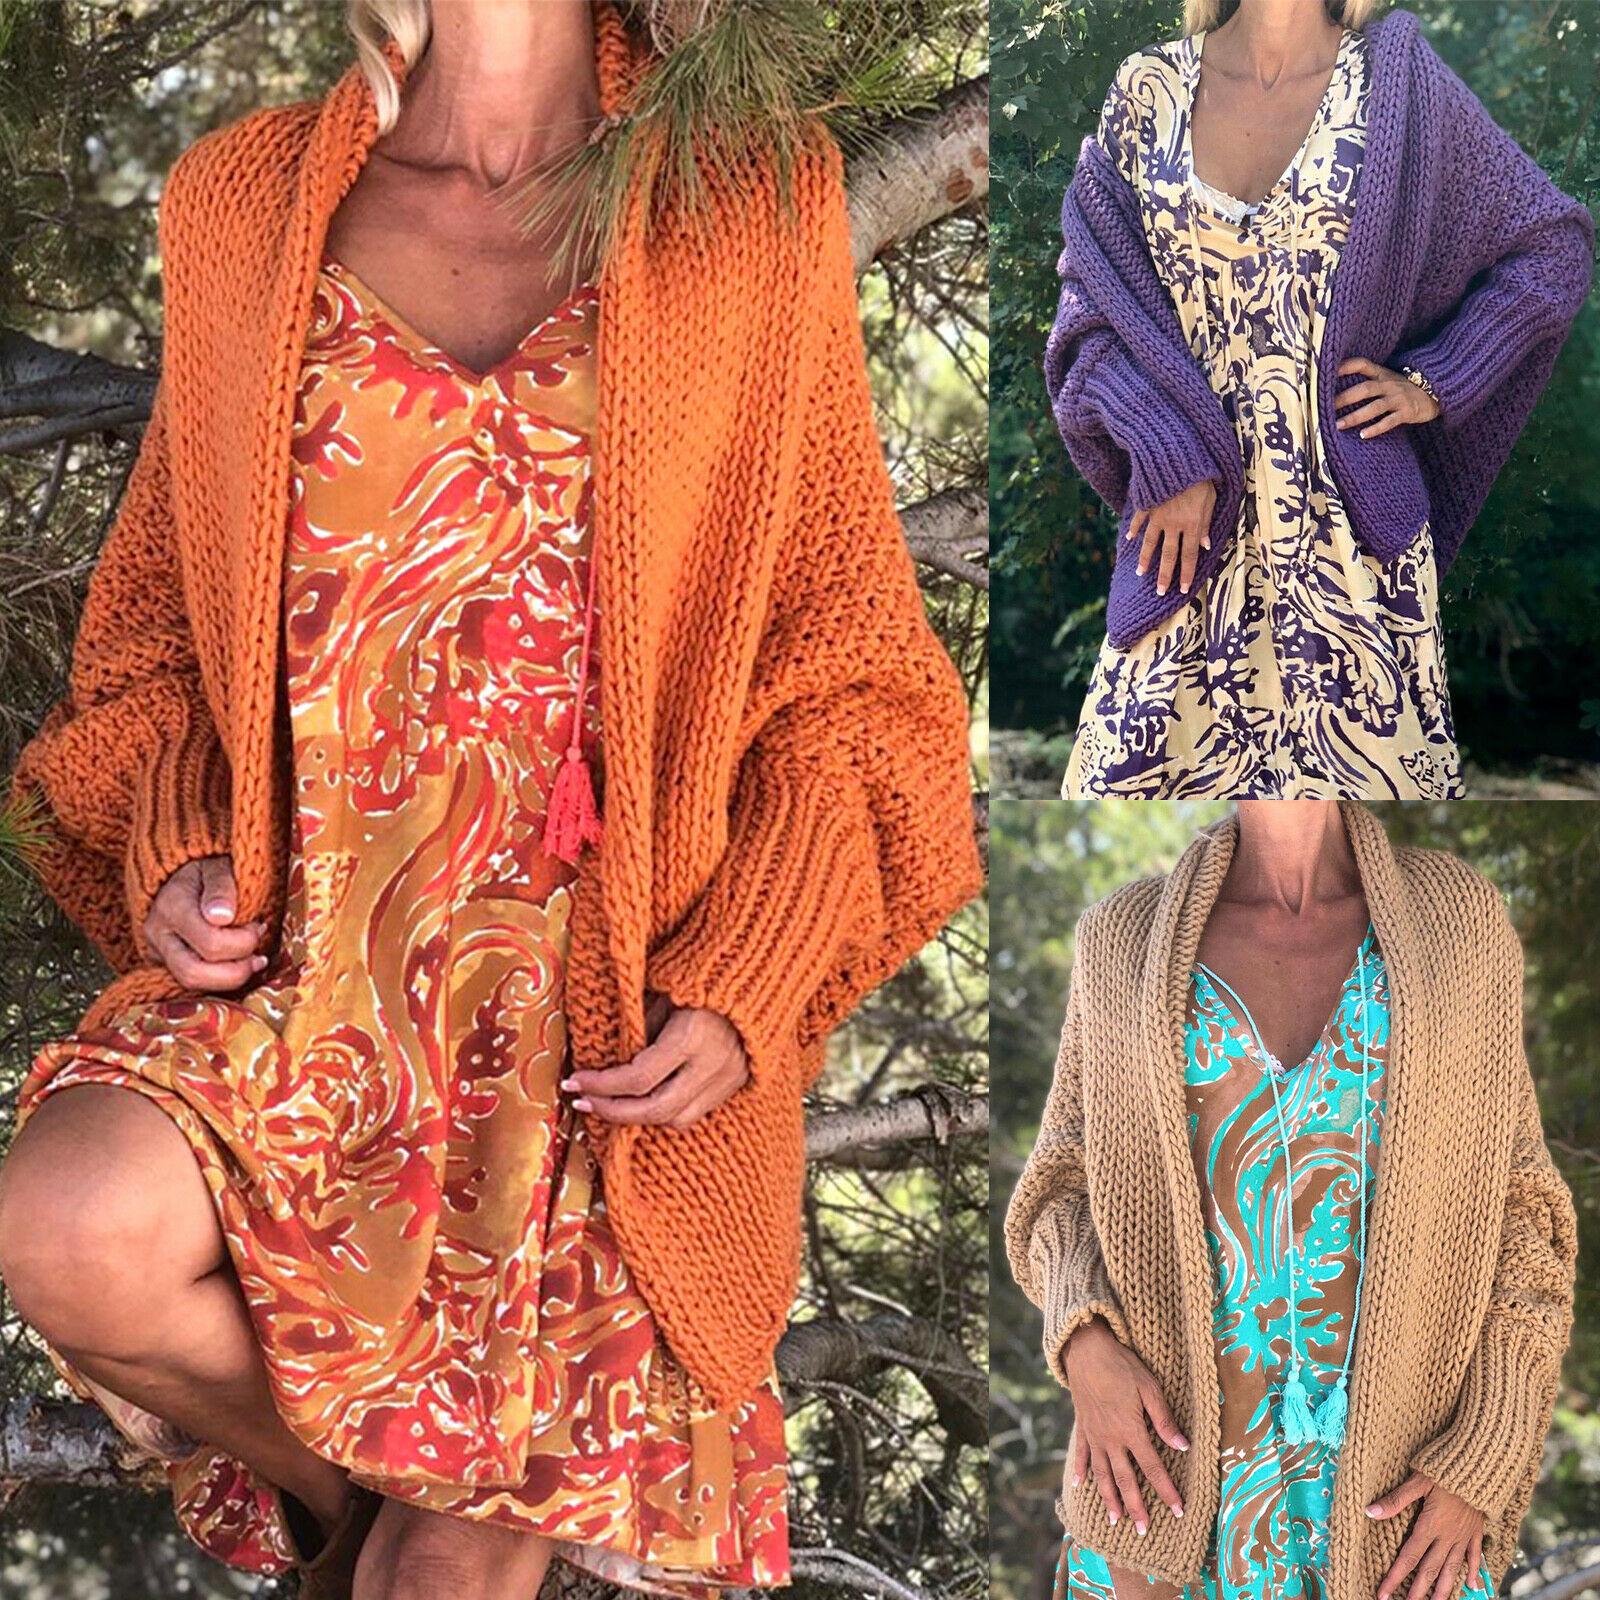 THE JENNIFER CARDI Batwing Long Sleeve Knit Open Cardigan Sweater - 3 Colors - Misses/Plus Size